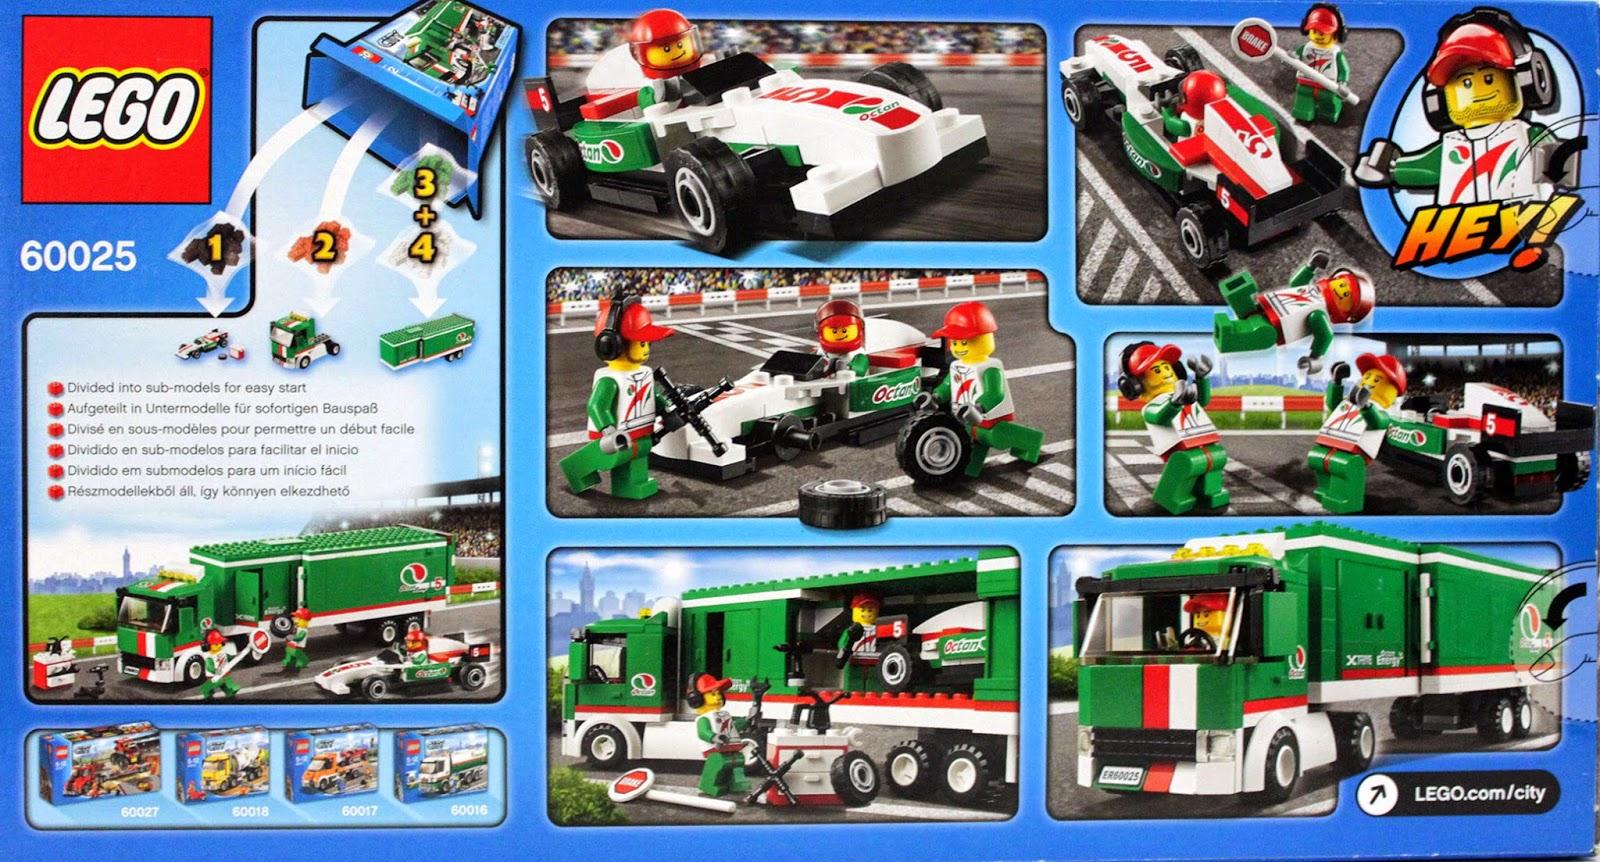 Lubo Creative Bricks Lego City 60025 Octan Racing Truck